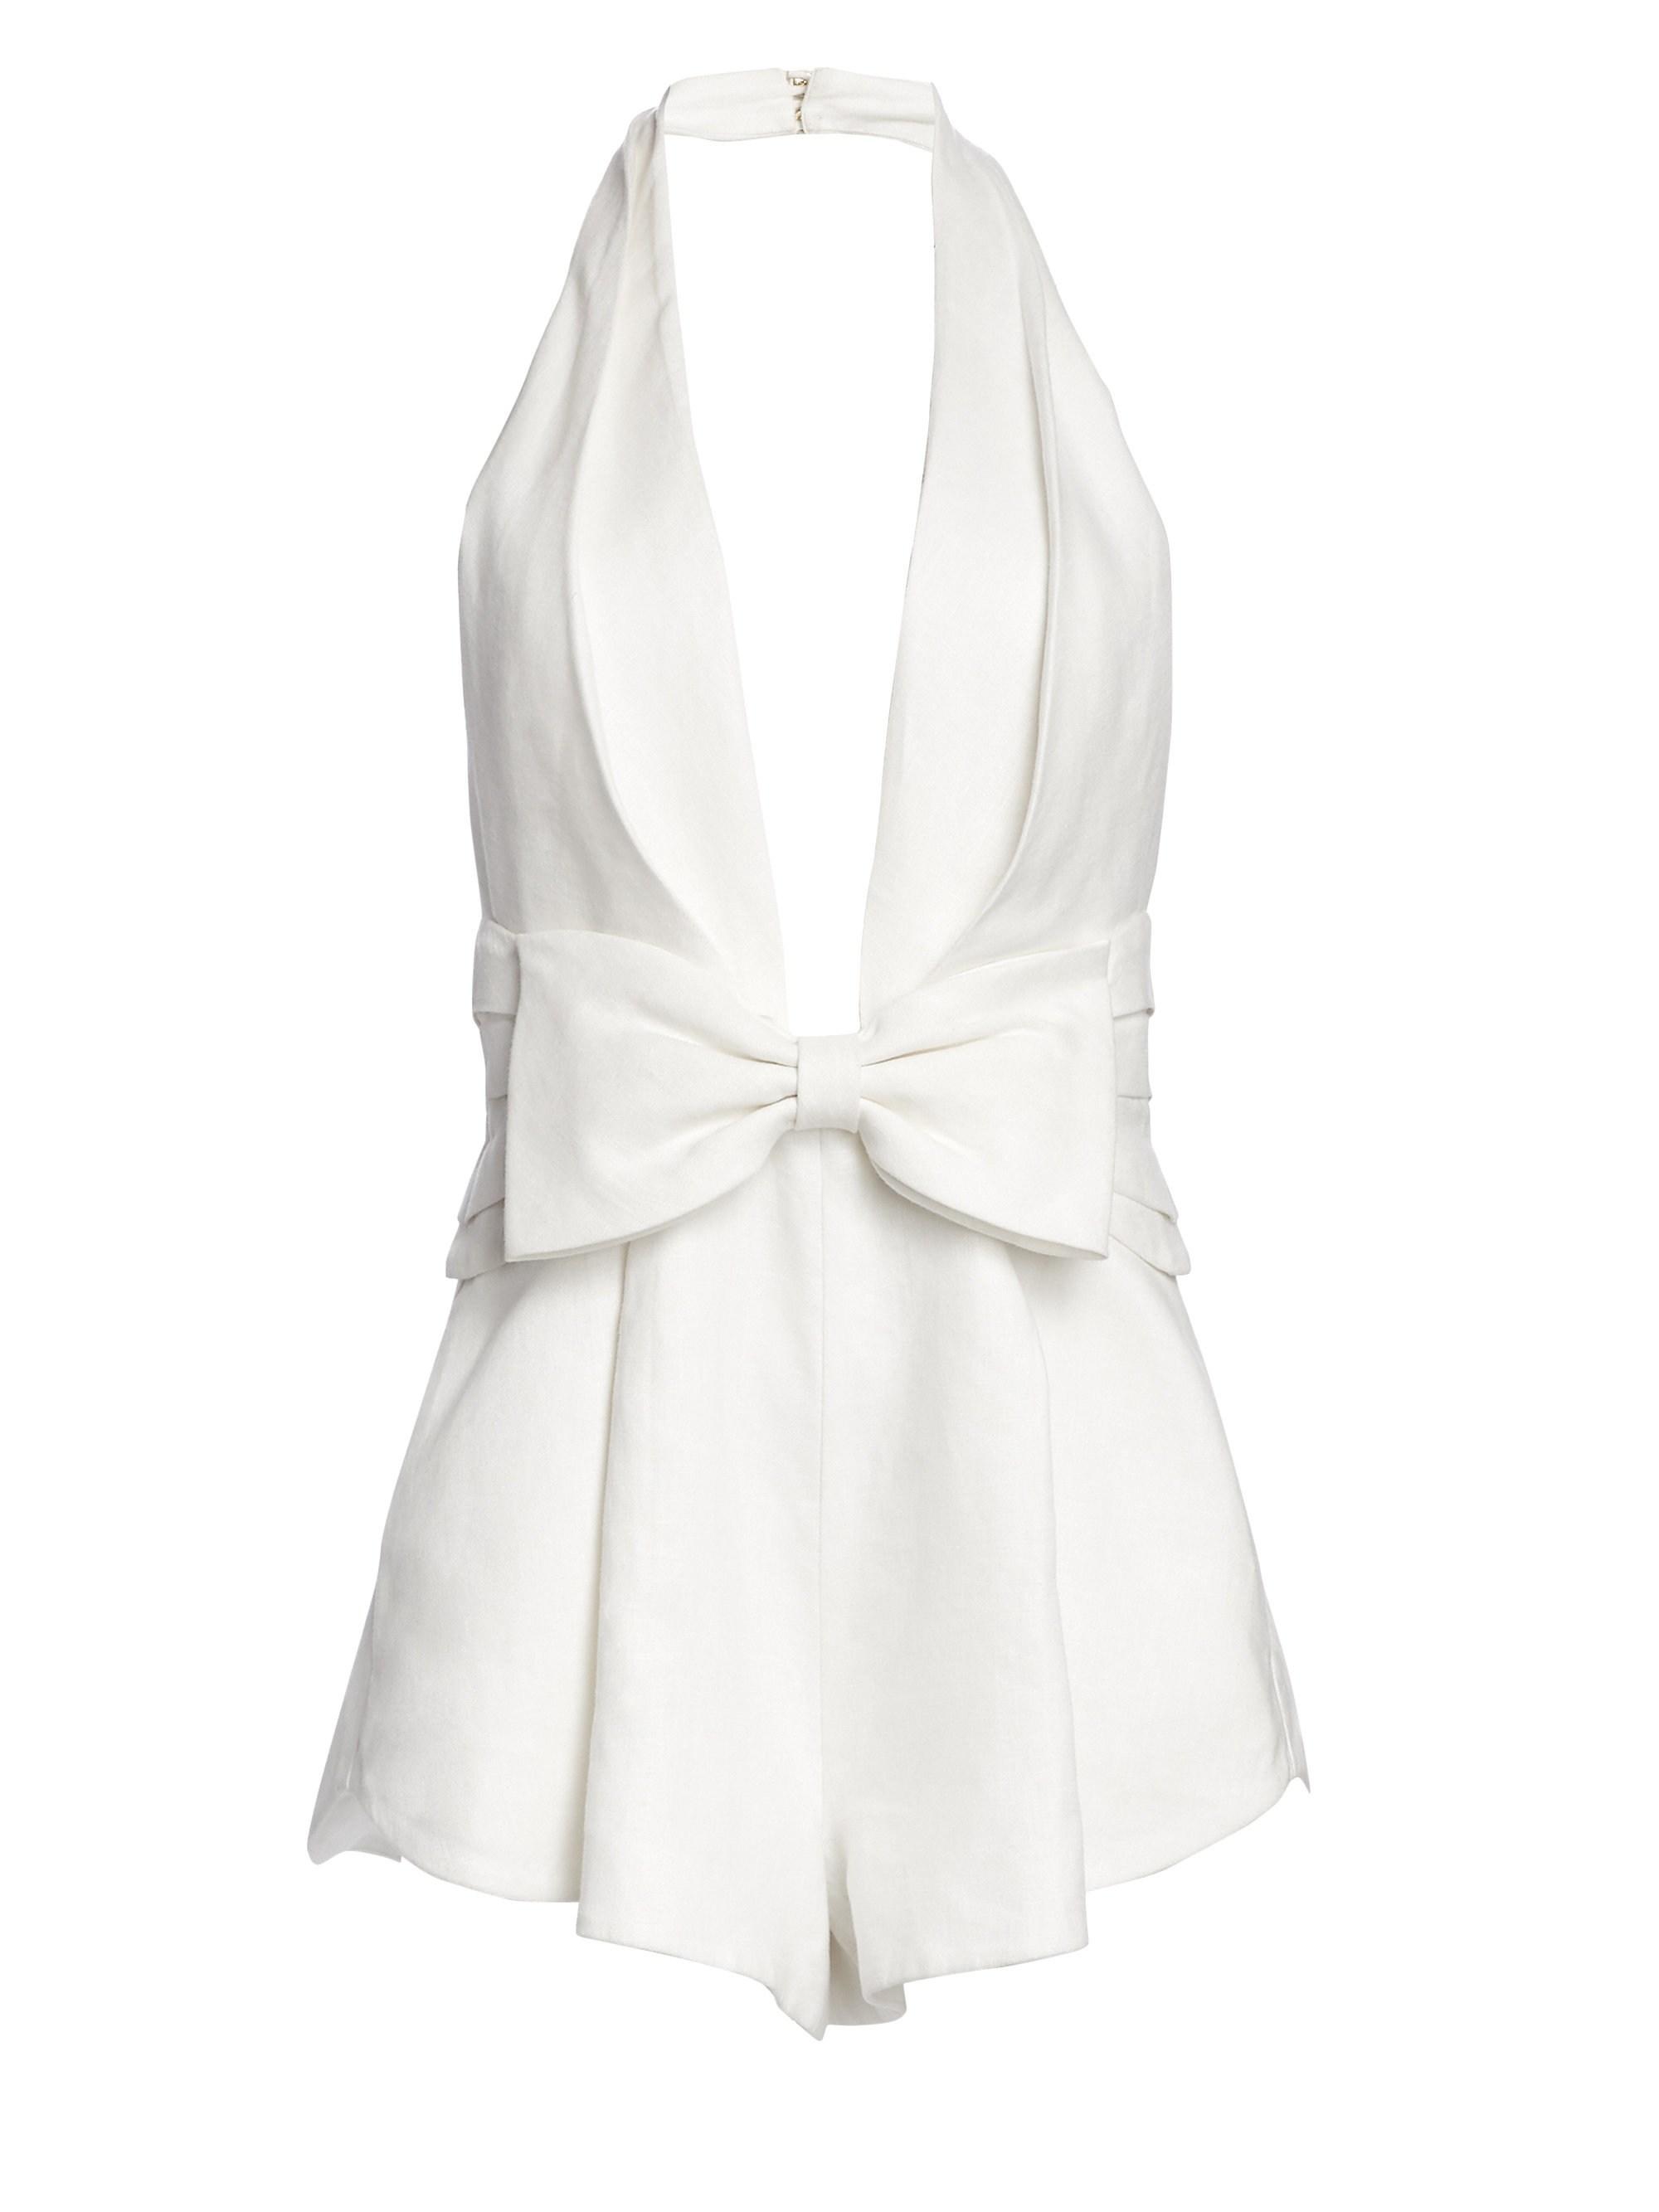 fe27c52b01a Lyst - Zimmermann Women s Corsage Tie Halter Neck Playsuit - Ivory ...